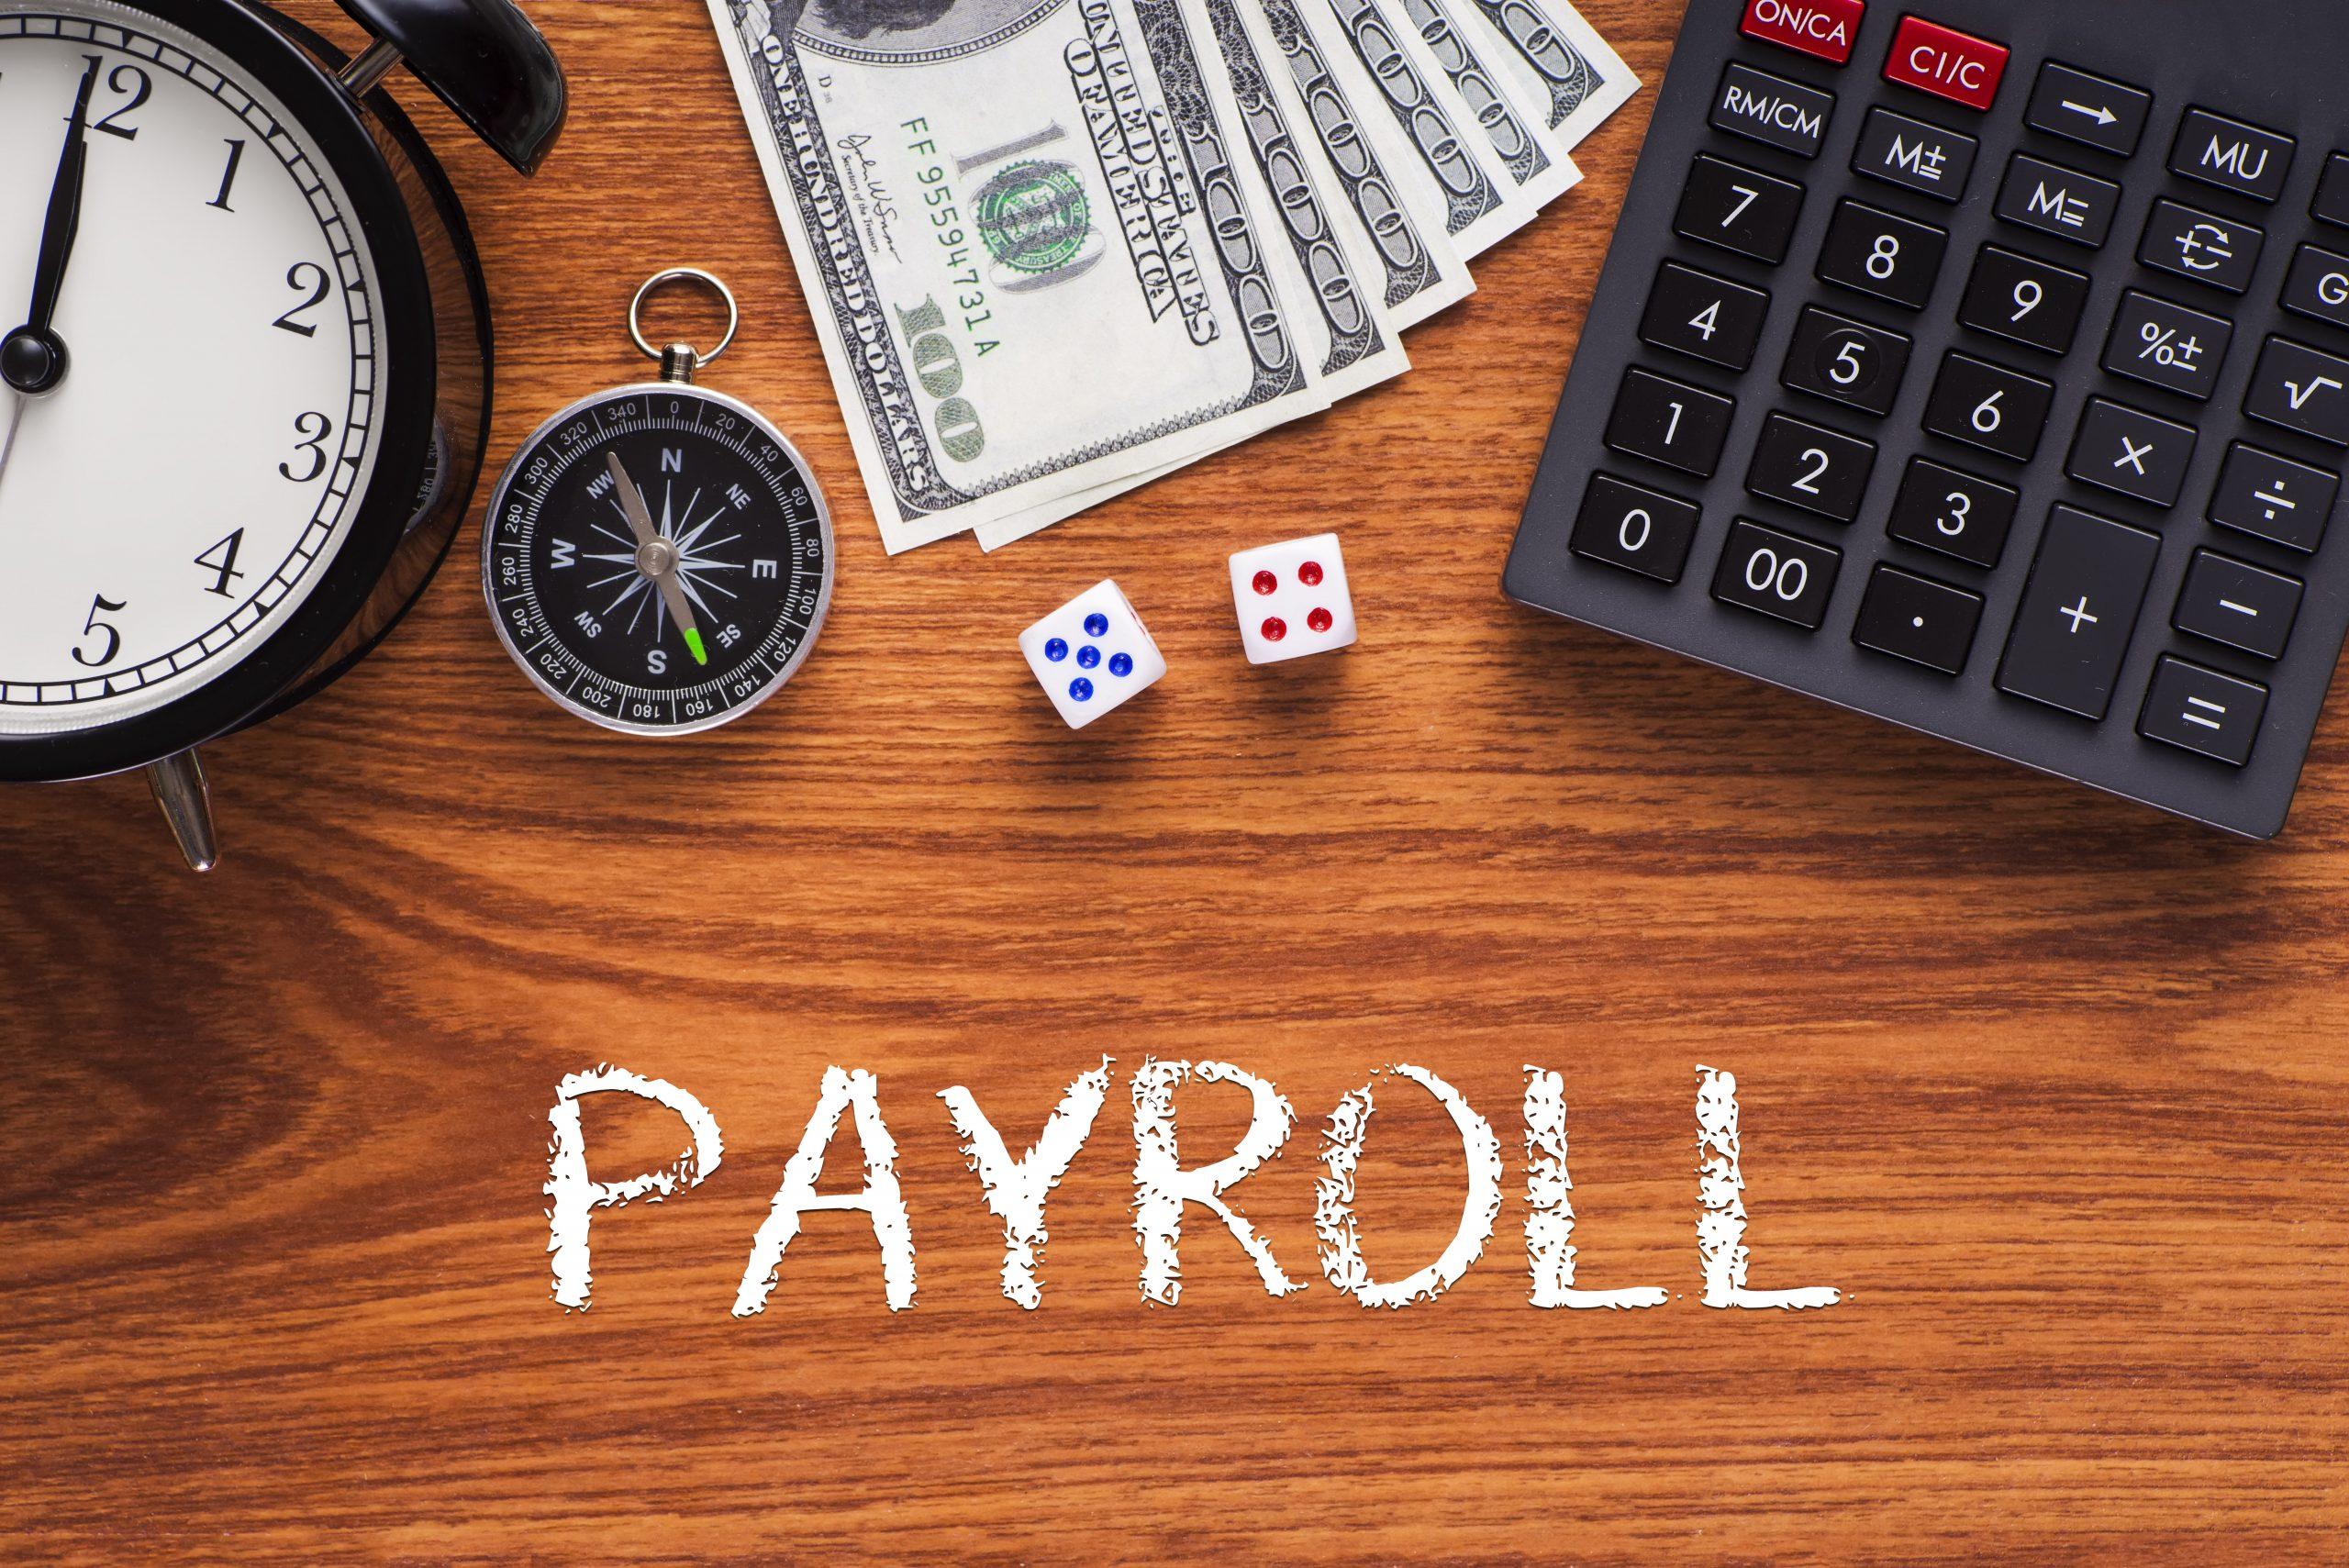 Payroll Calculation Image